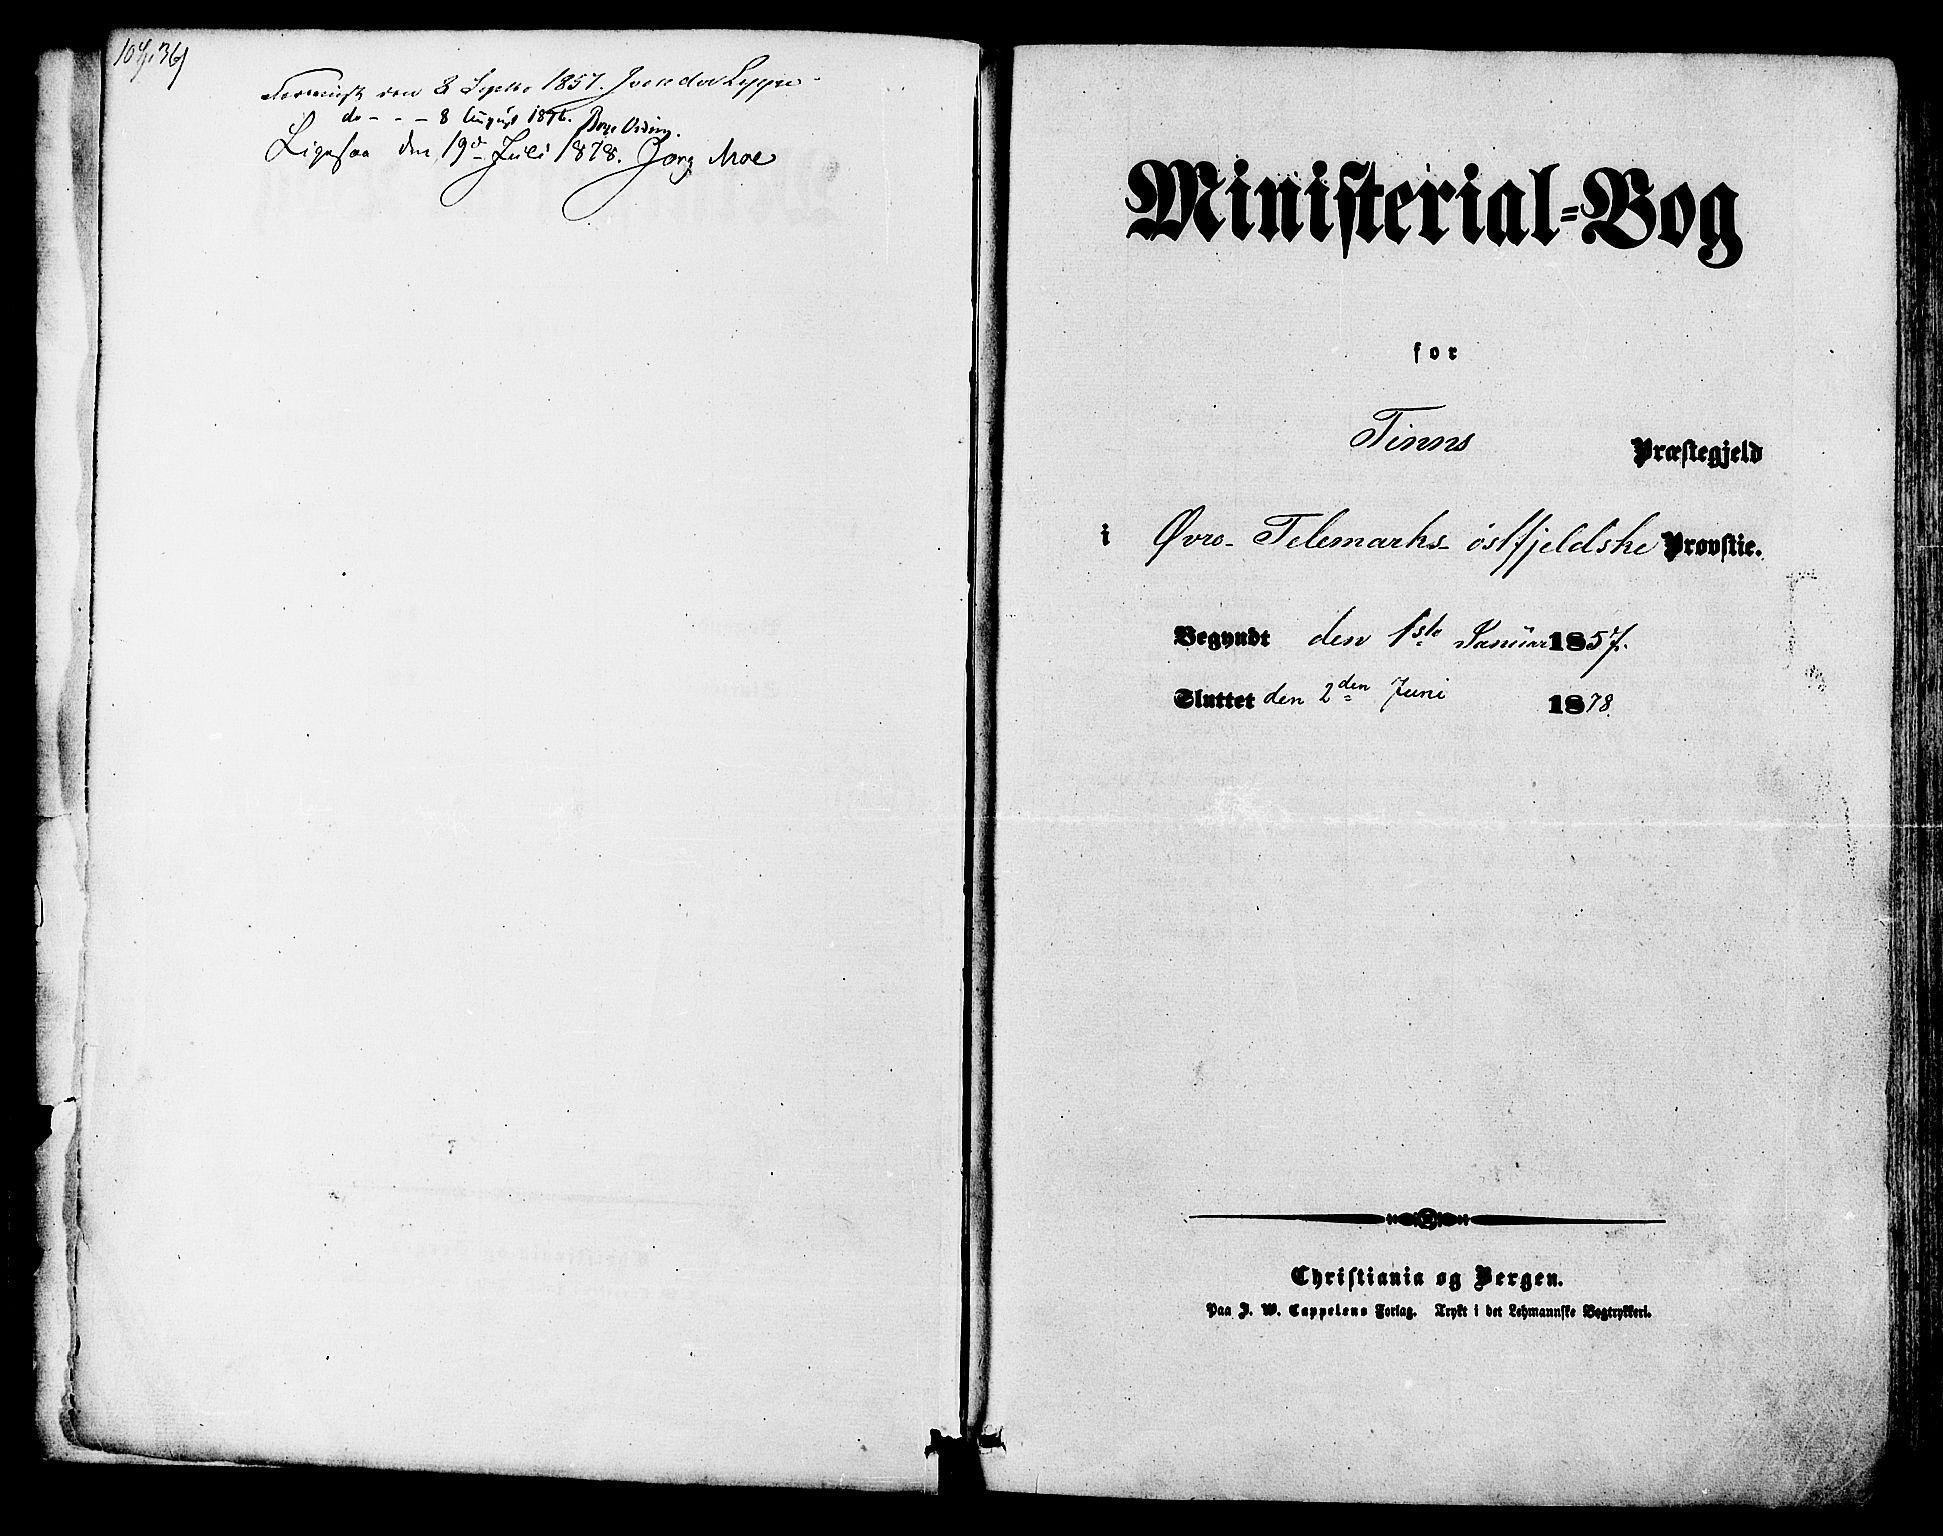 SAKO, Tinn kirkebøker, F/Fa/L0006: Parish register (official) no. I 6, 1857-1878